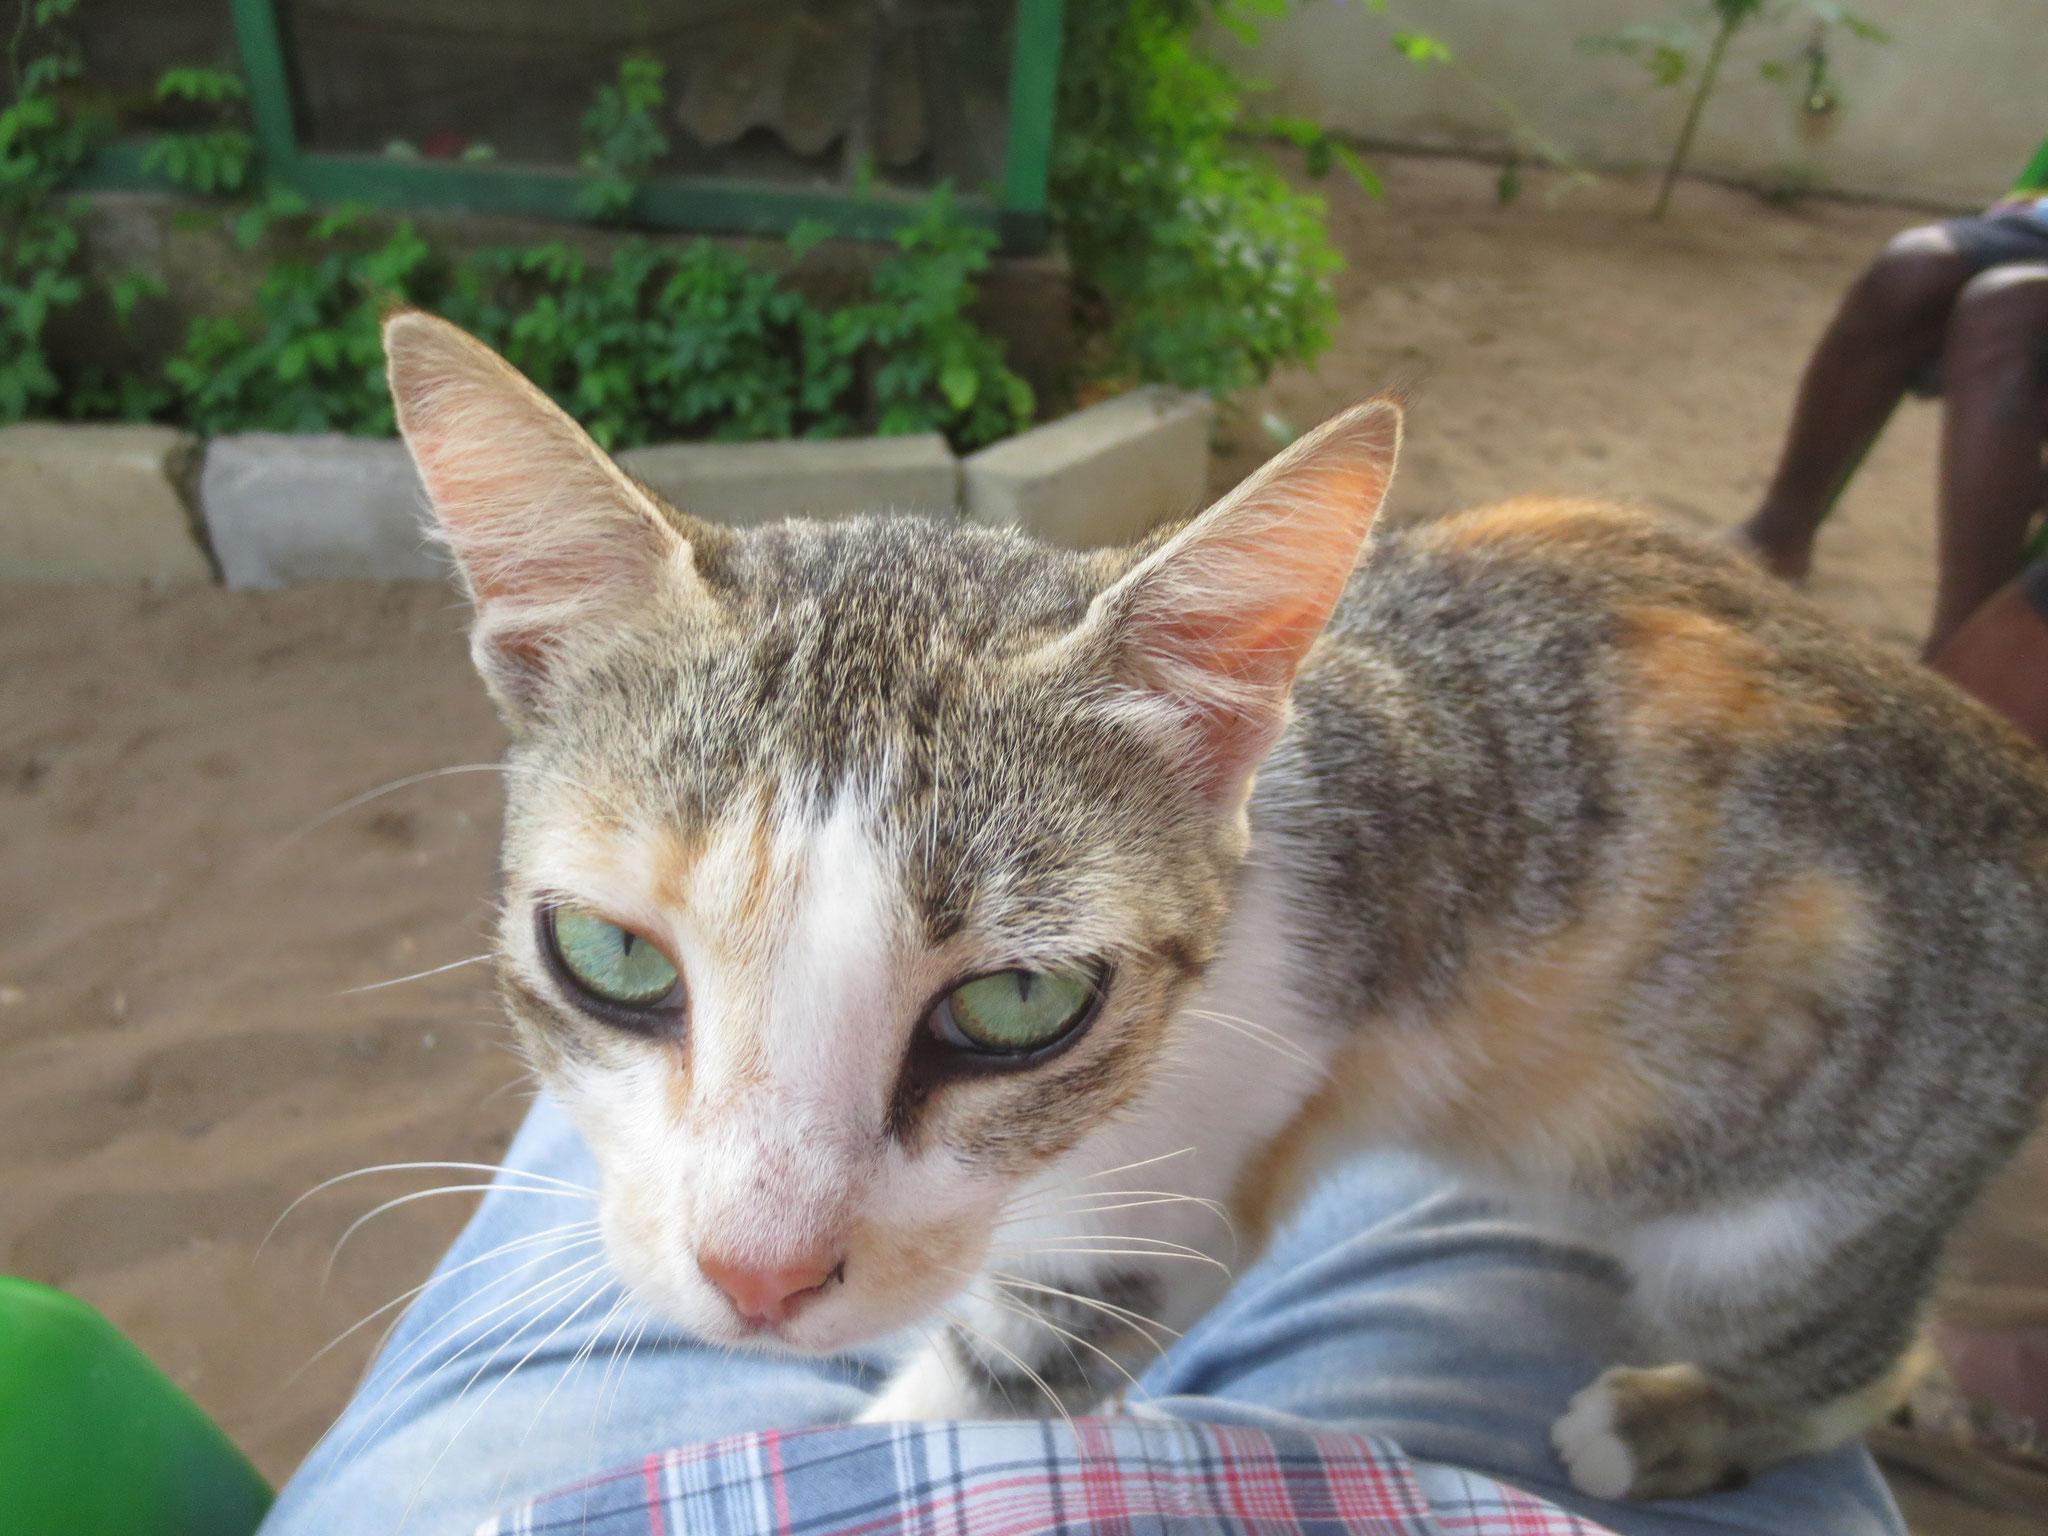 Unsere Katze ertrank am Freitag dem 13.10.2017